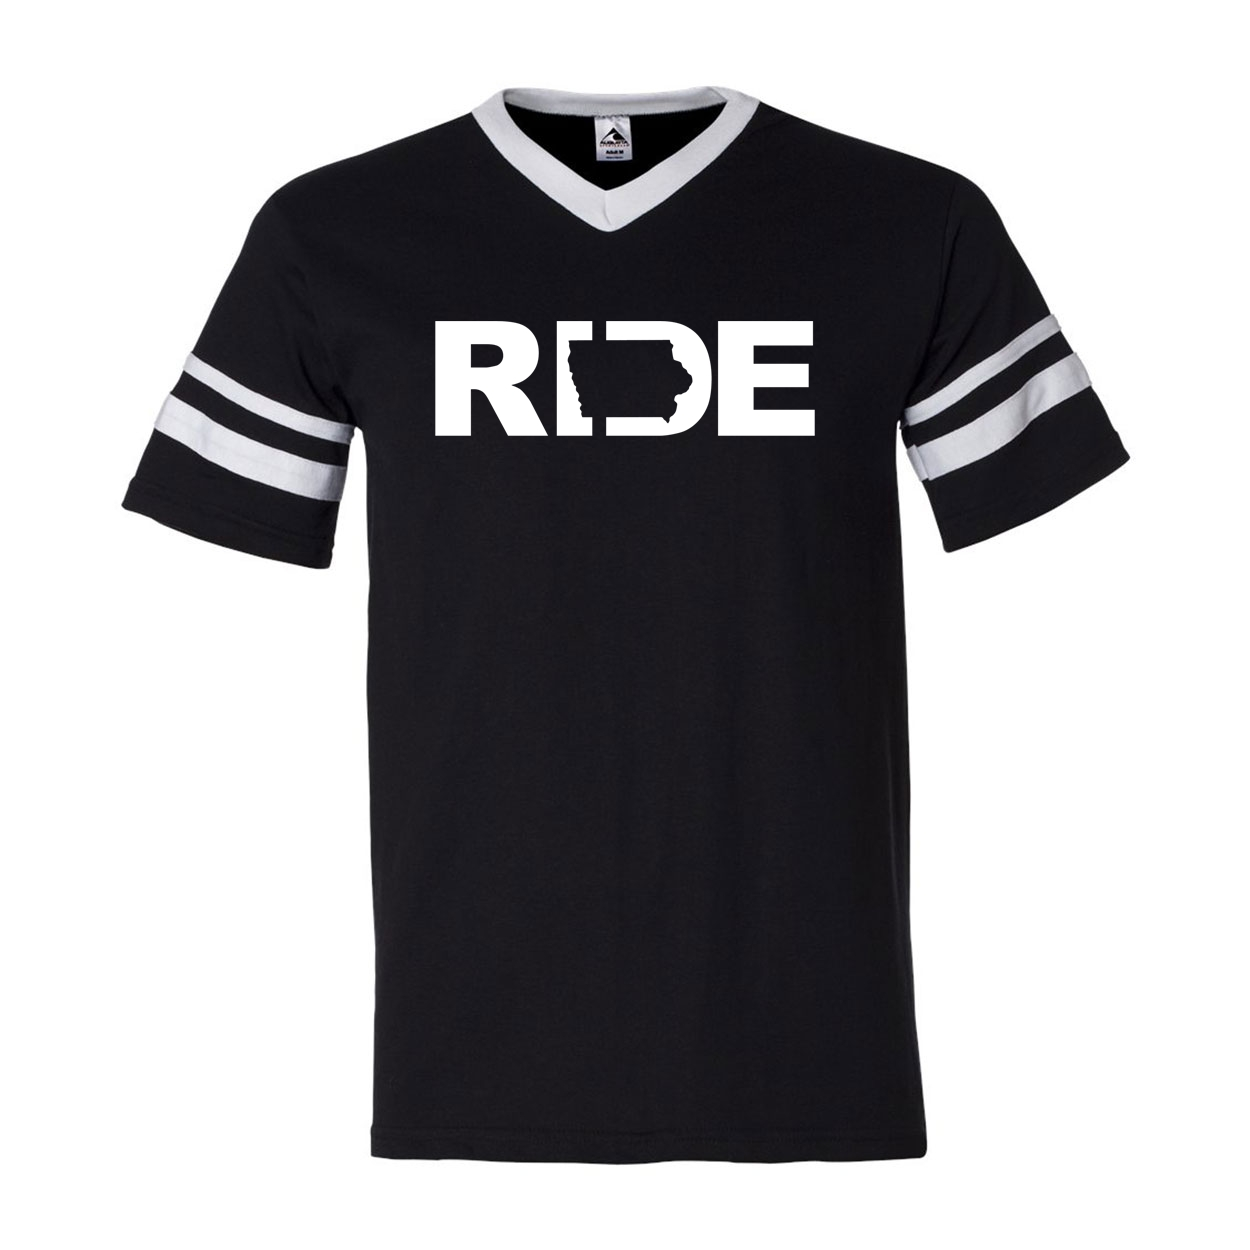 Ride Iowa Classic Premium Striped Jersey T-Shirt Black/White (White Logo)